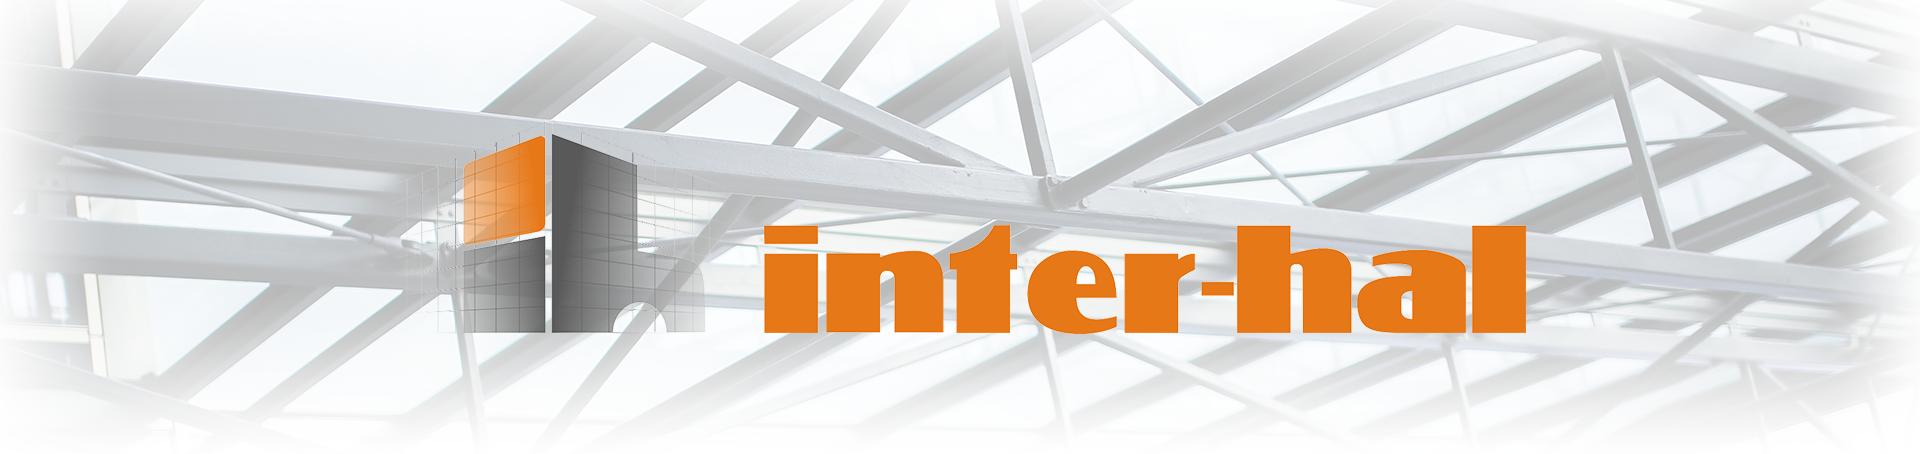 Inter-hal_logo_o_mnie